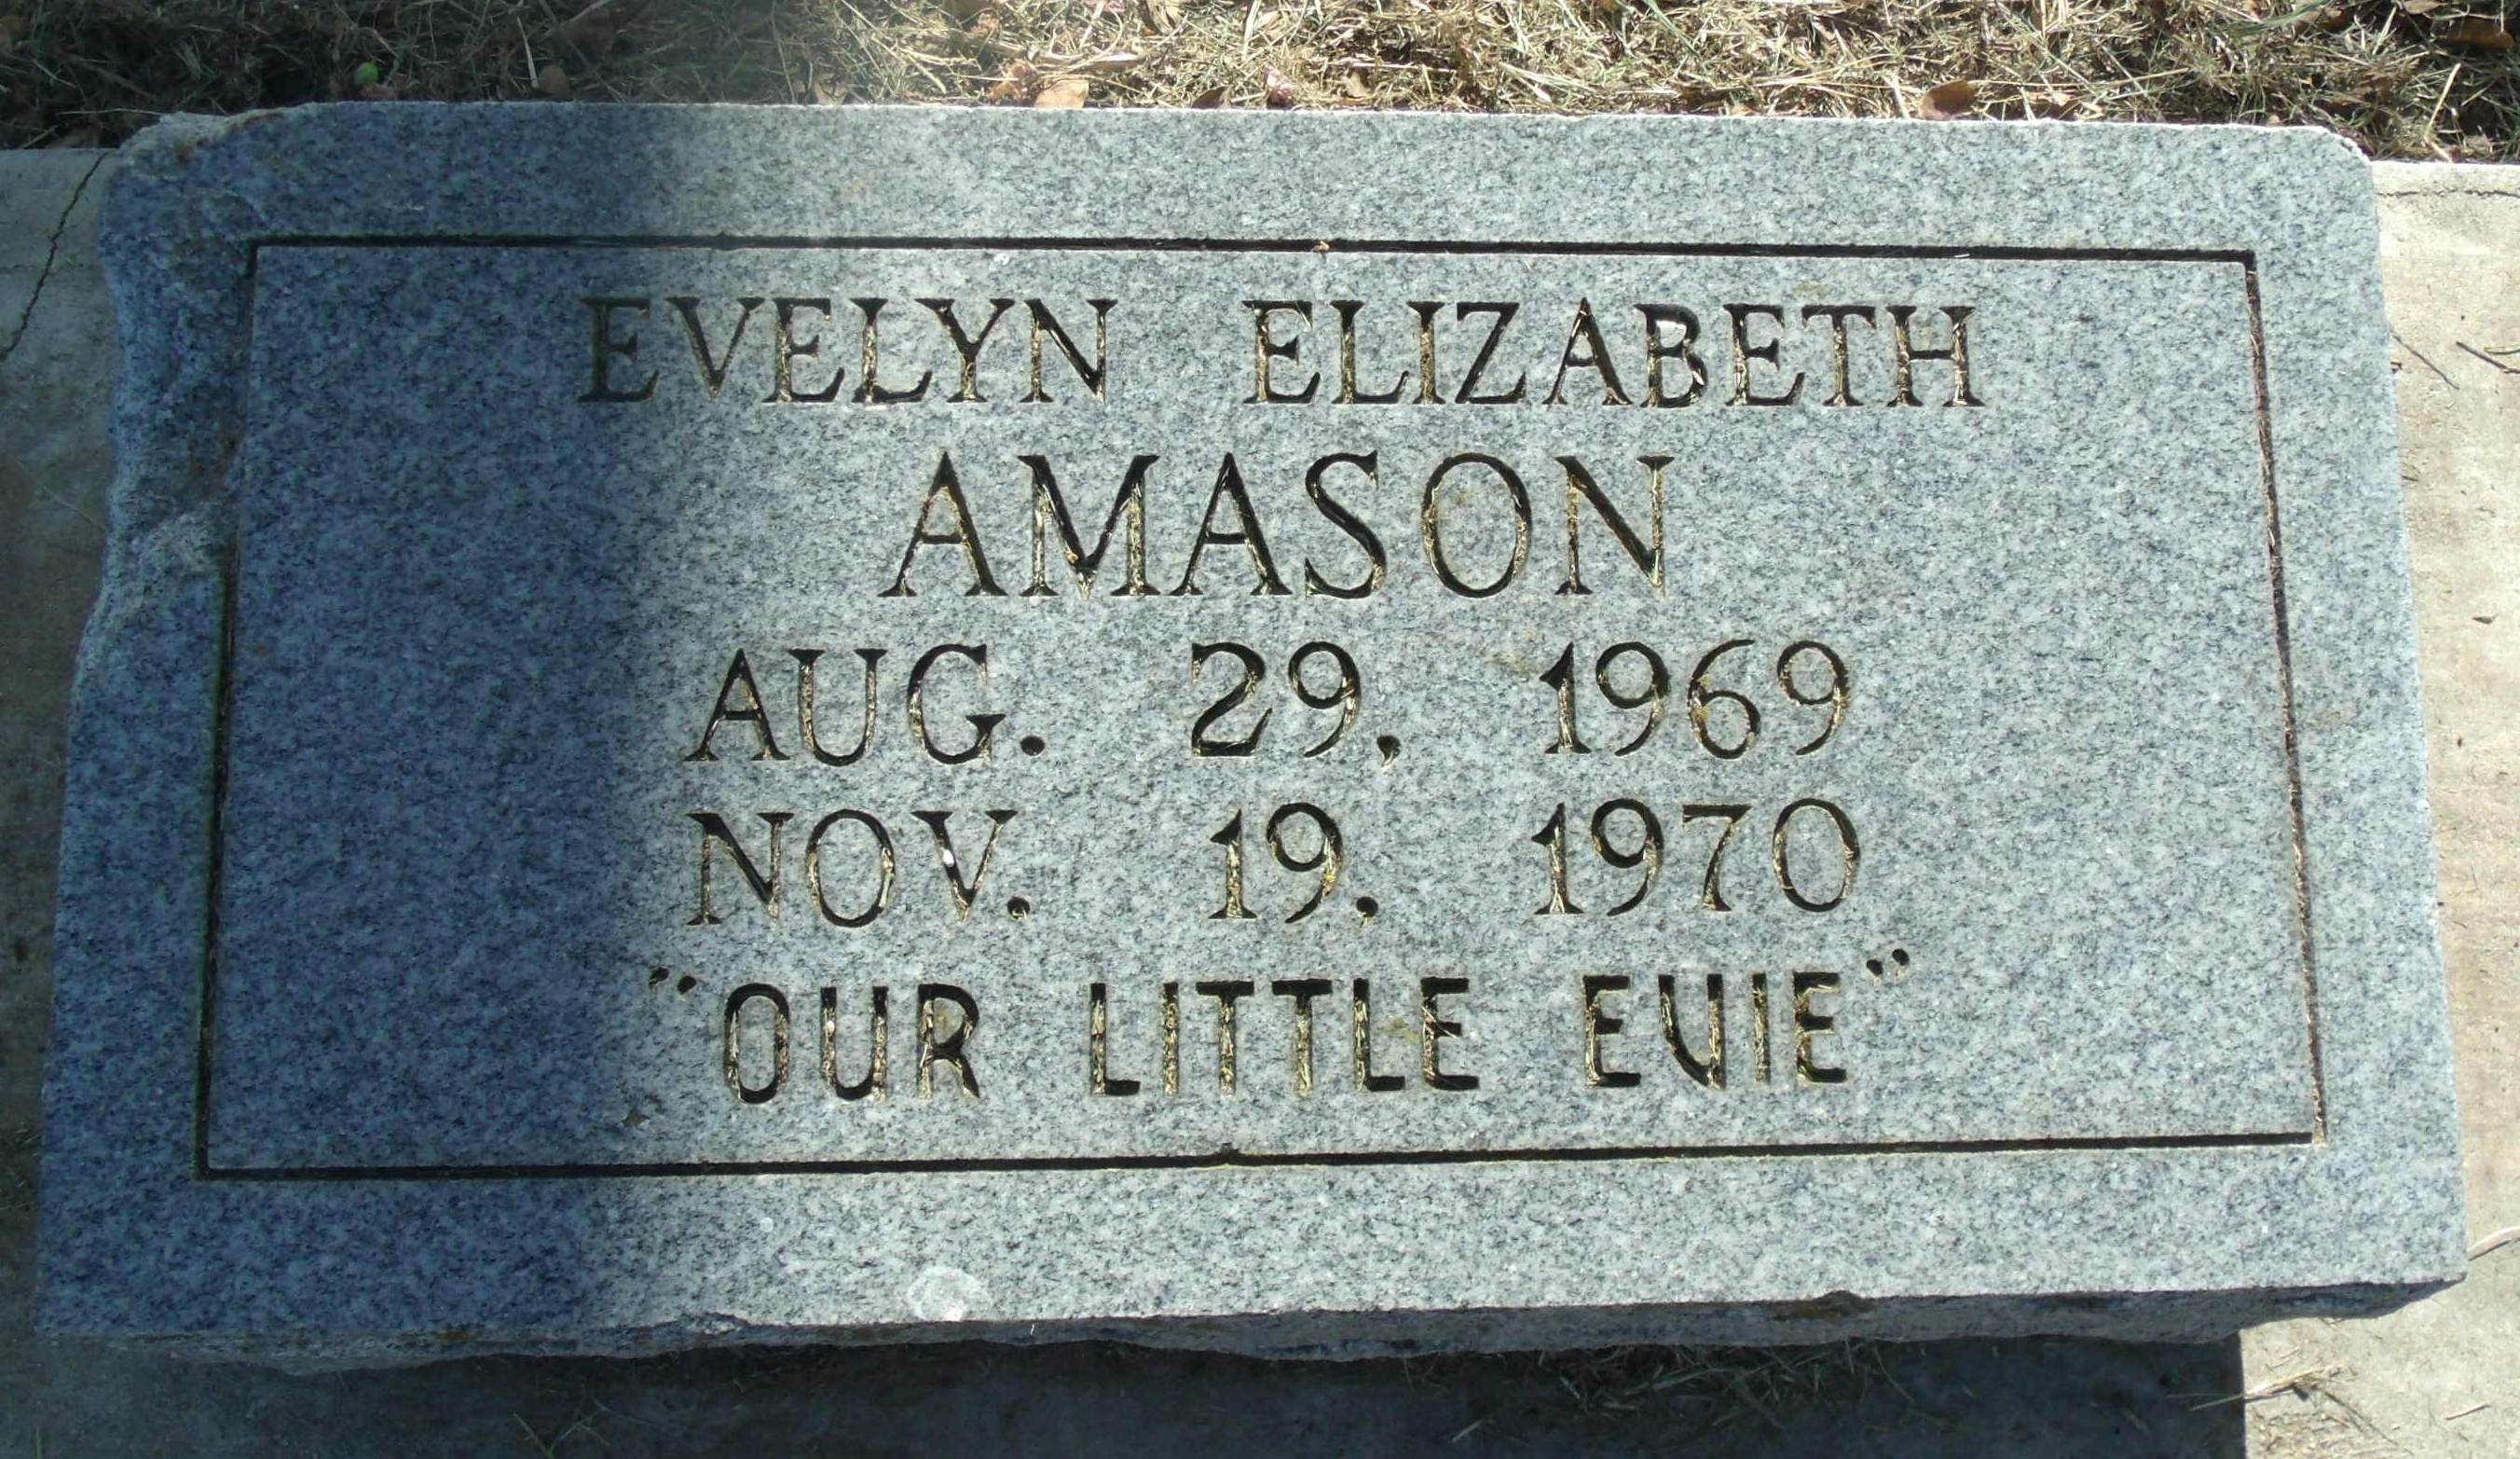 Evelyn Elizabeth Amason